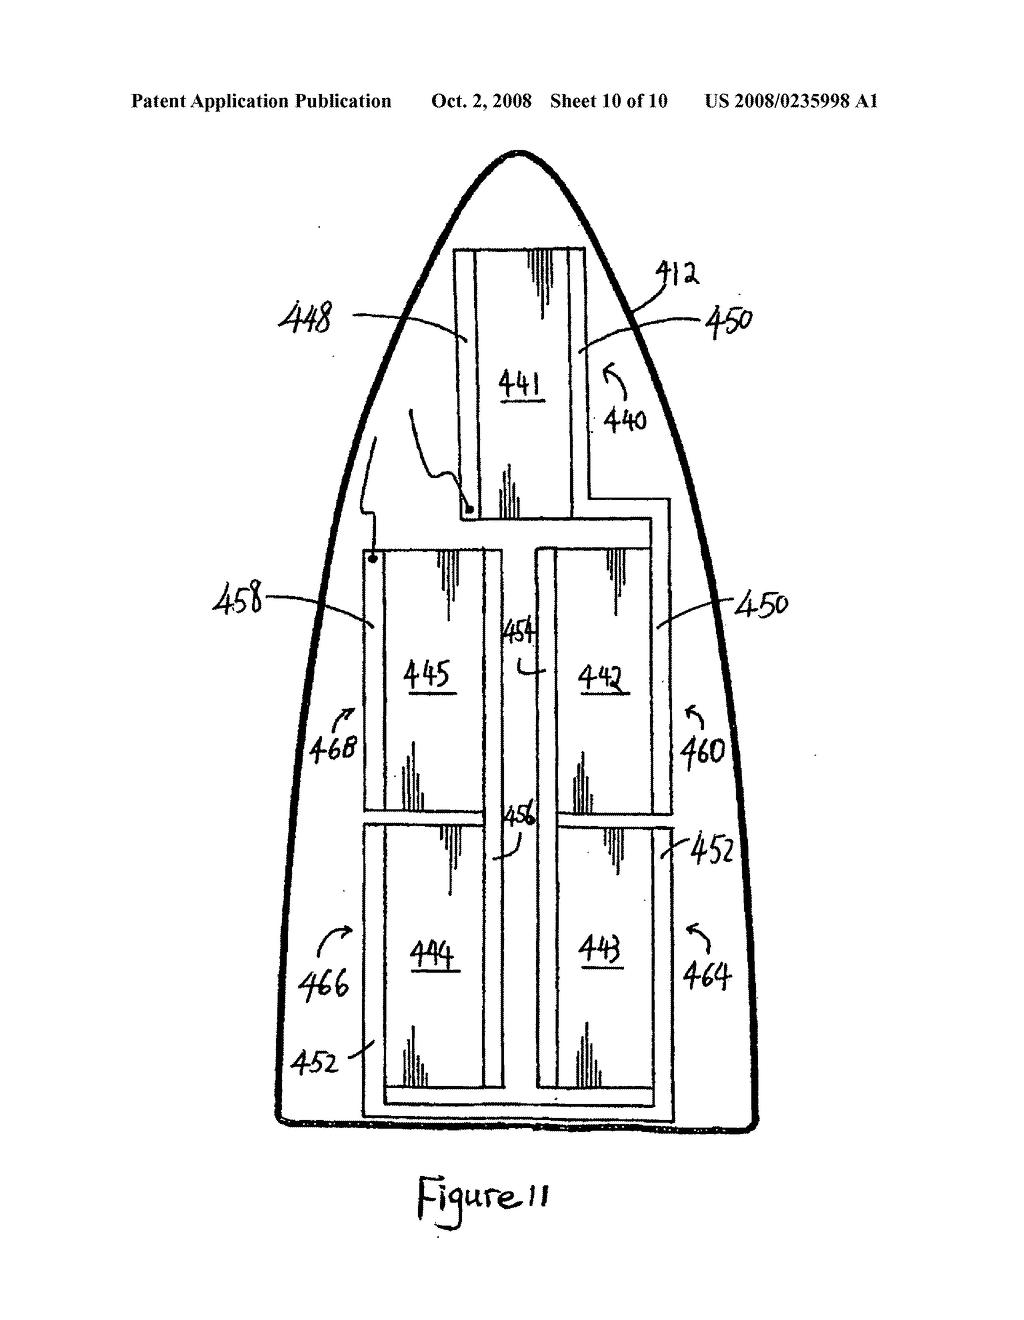 hight resolution of electric iron diagram schematic and image 11 cobalt diagram diagram of electric iron